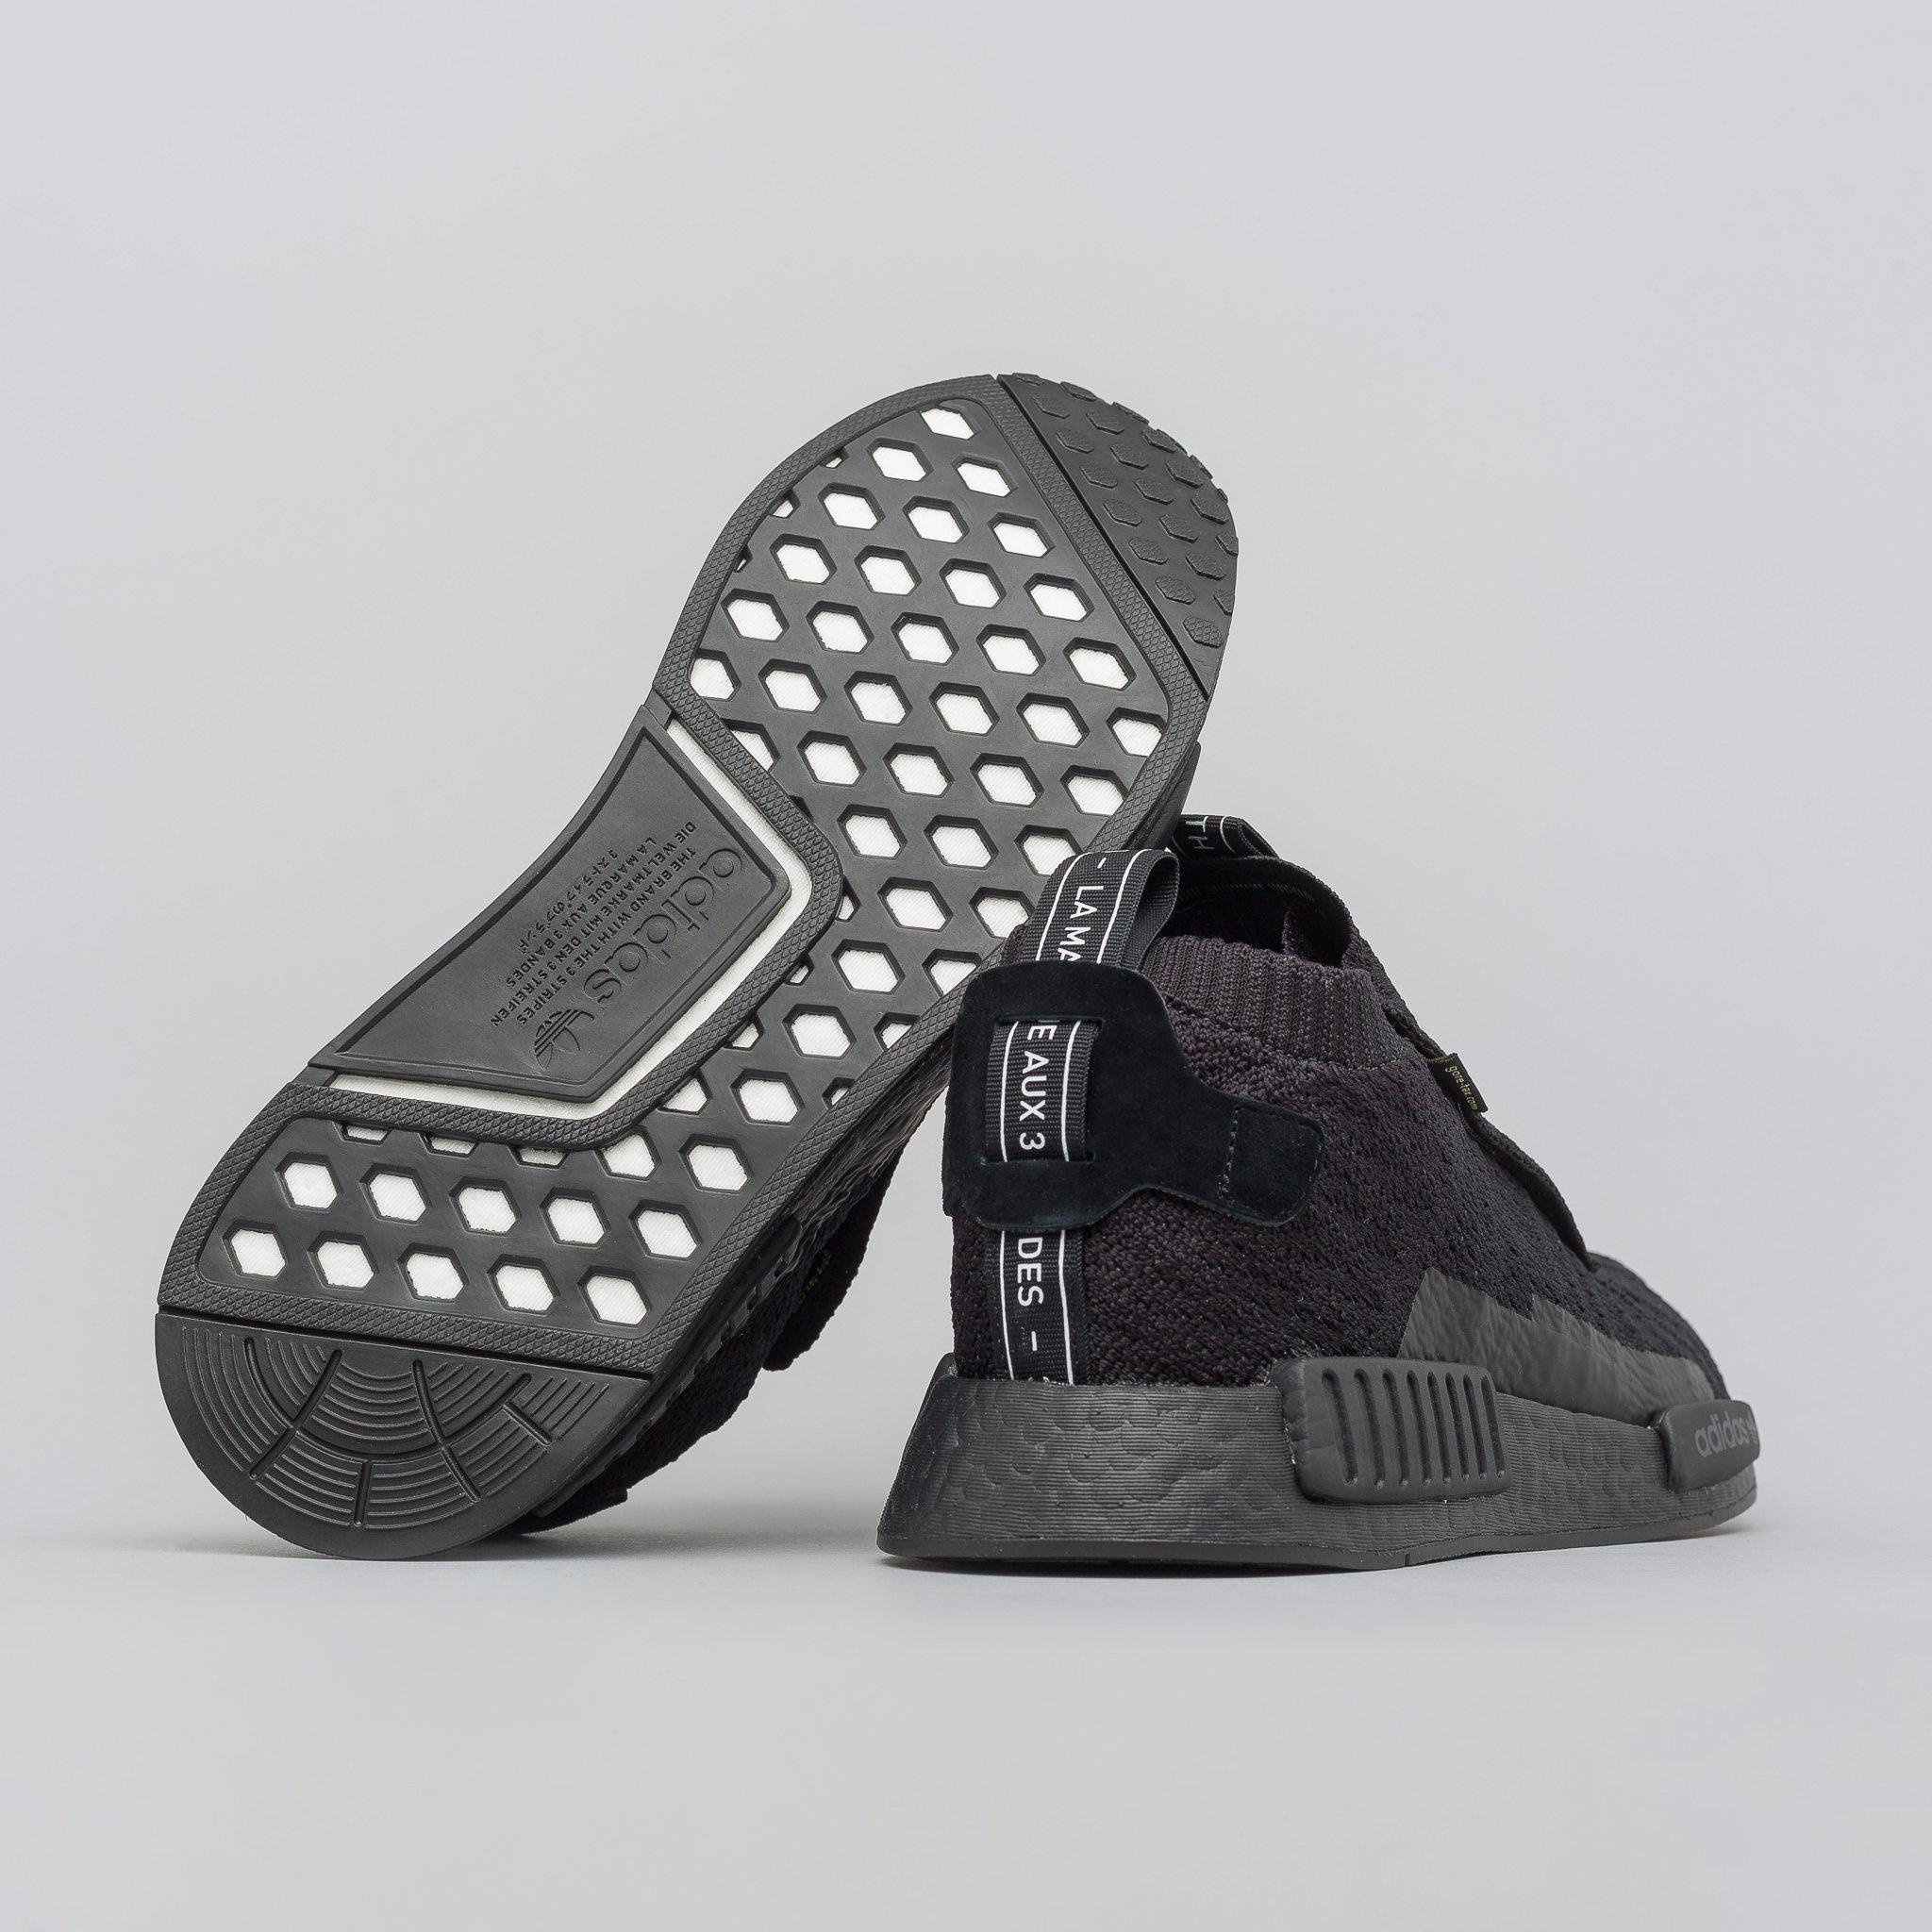 1ea573221f4601 Lyst - adidas Nmd Ts1 Primeknit Gtx In Core Black in Black for Men